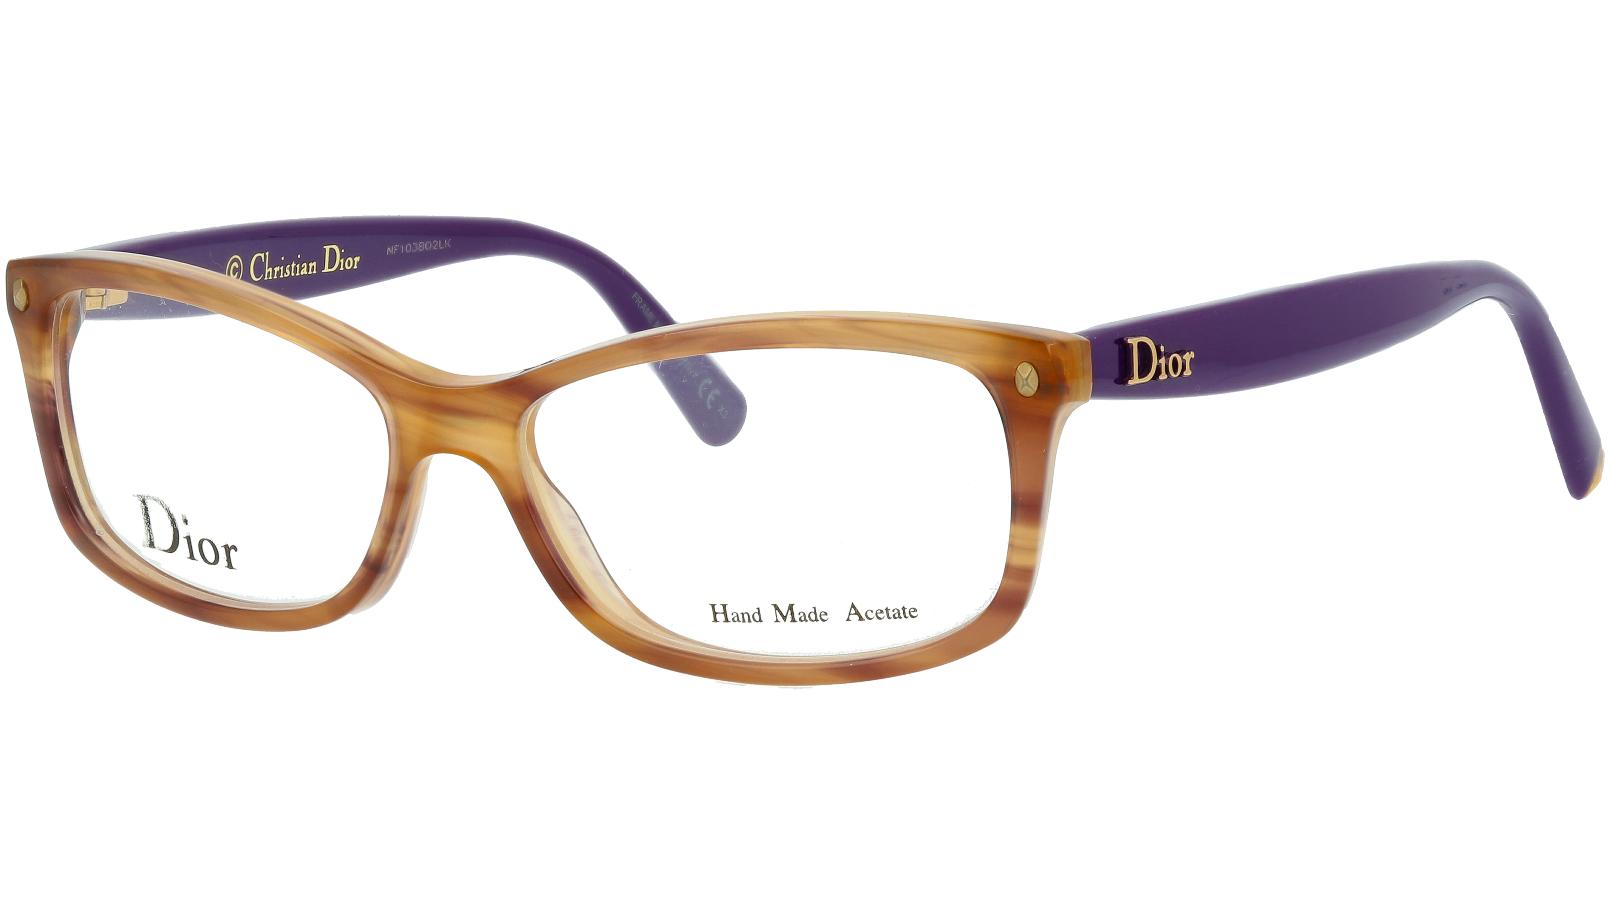 DIOR CD3232 PW5 52 HAVANA Glasses